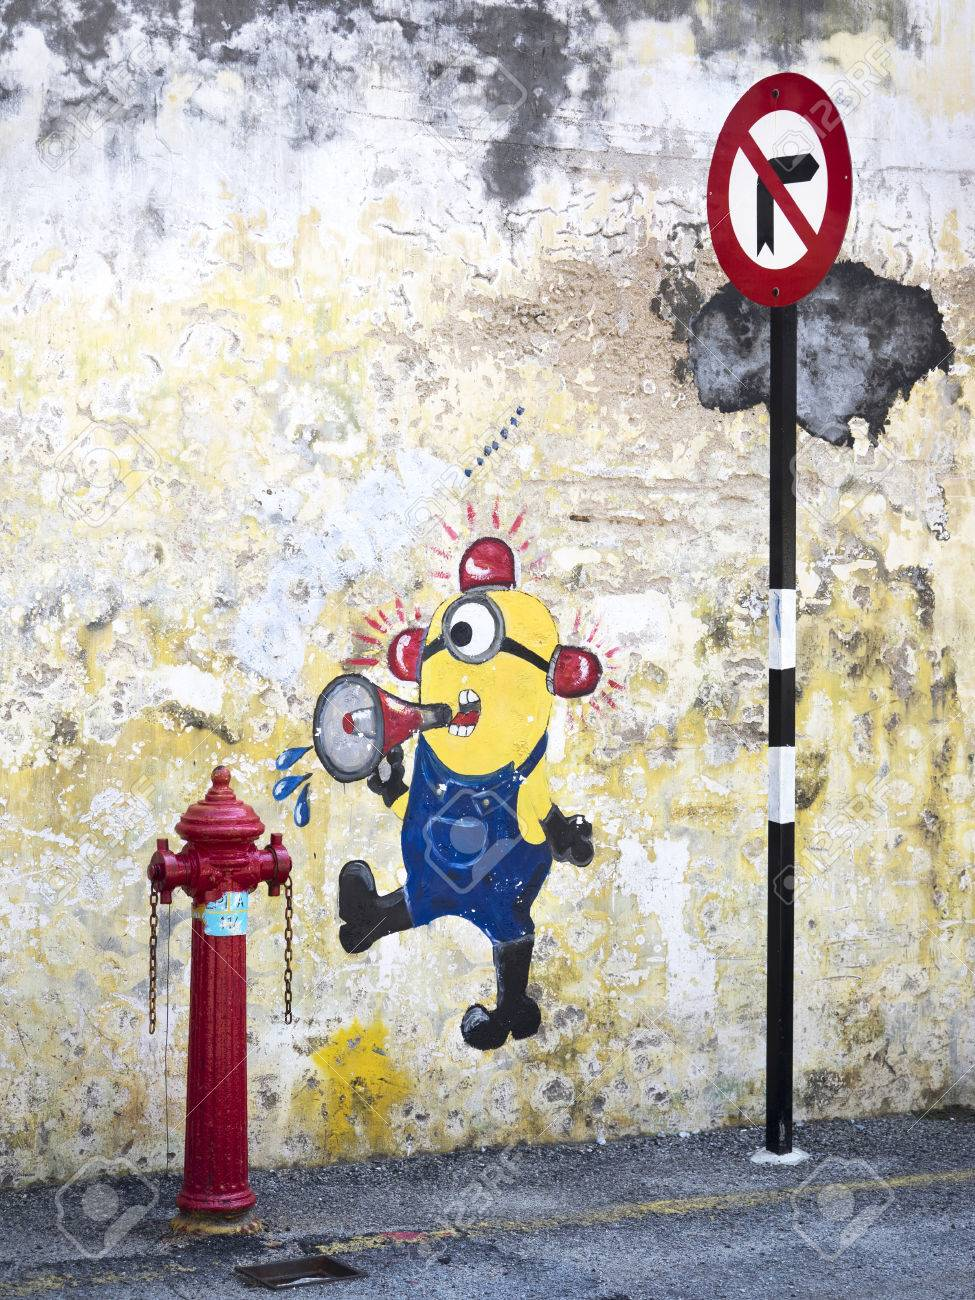 Graffiti Animation Street Art Painting Of Minion From Popular Animation Movie